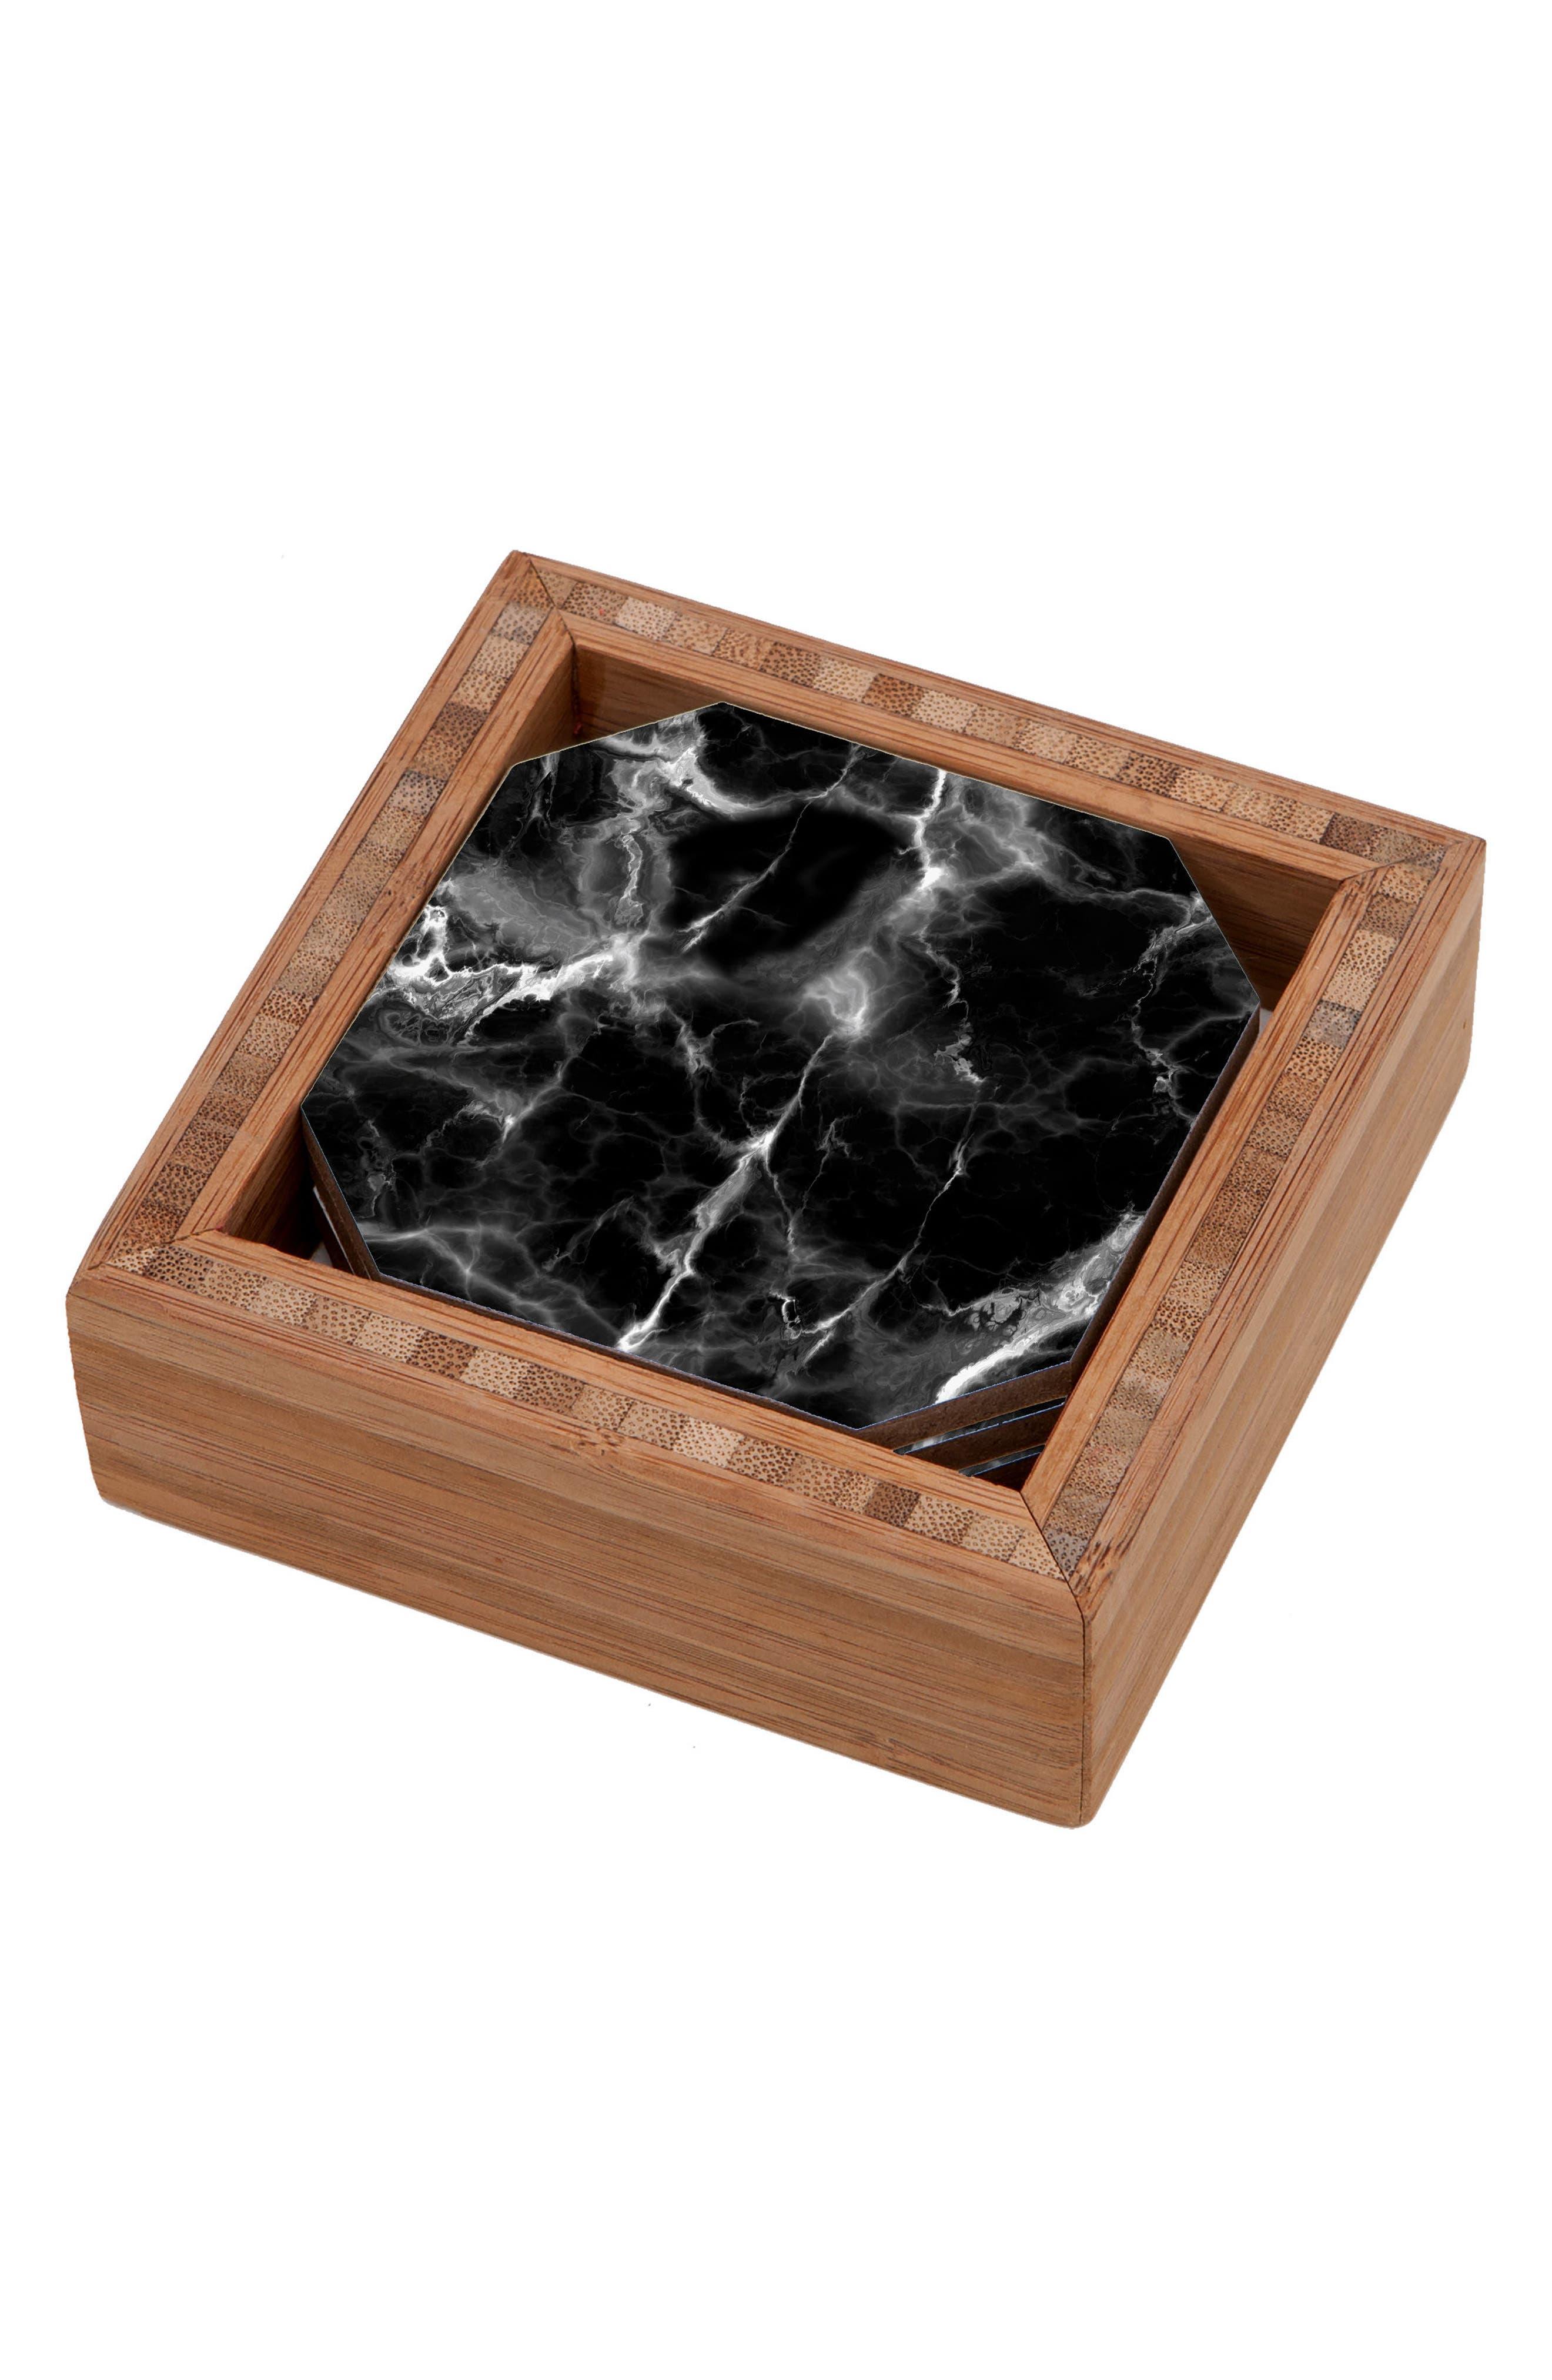 Main Image - Deny Designs Marble No. 2 Set of 4 Coasters